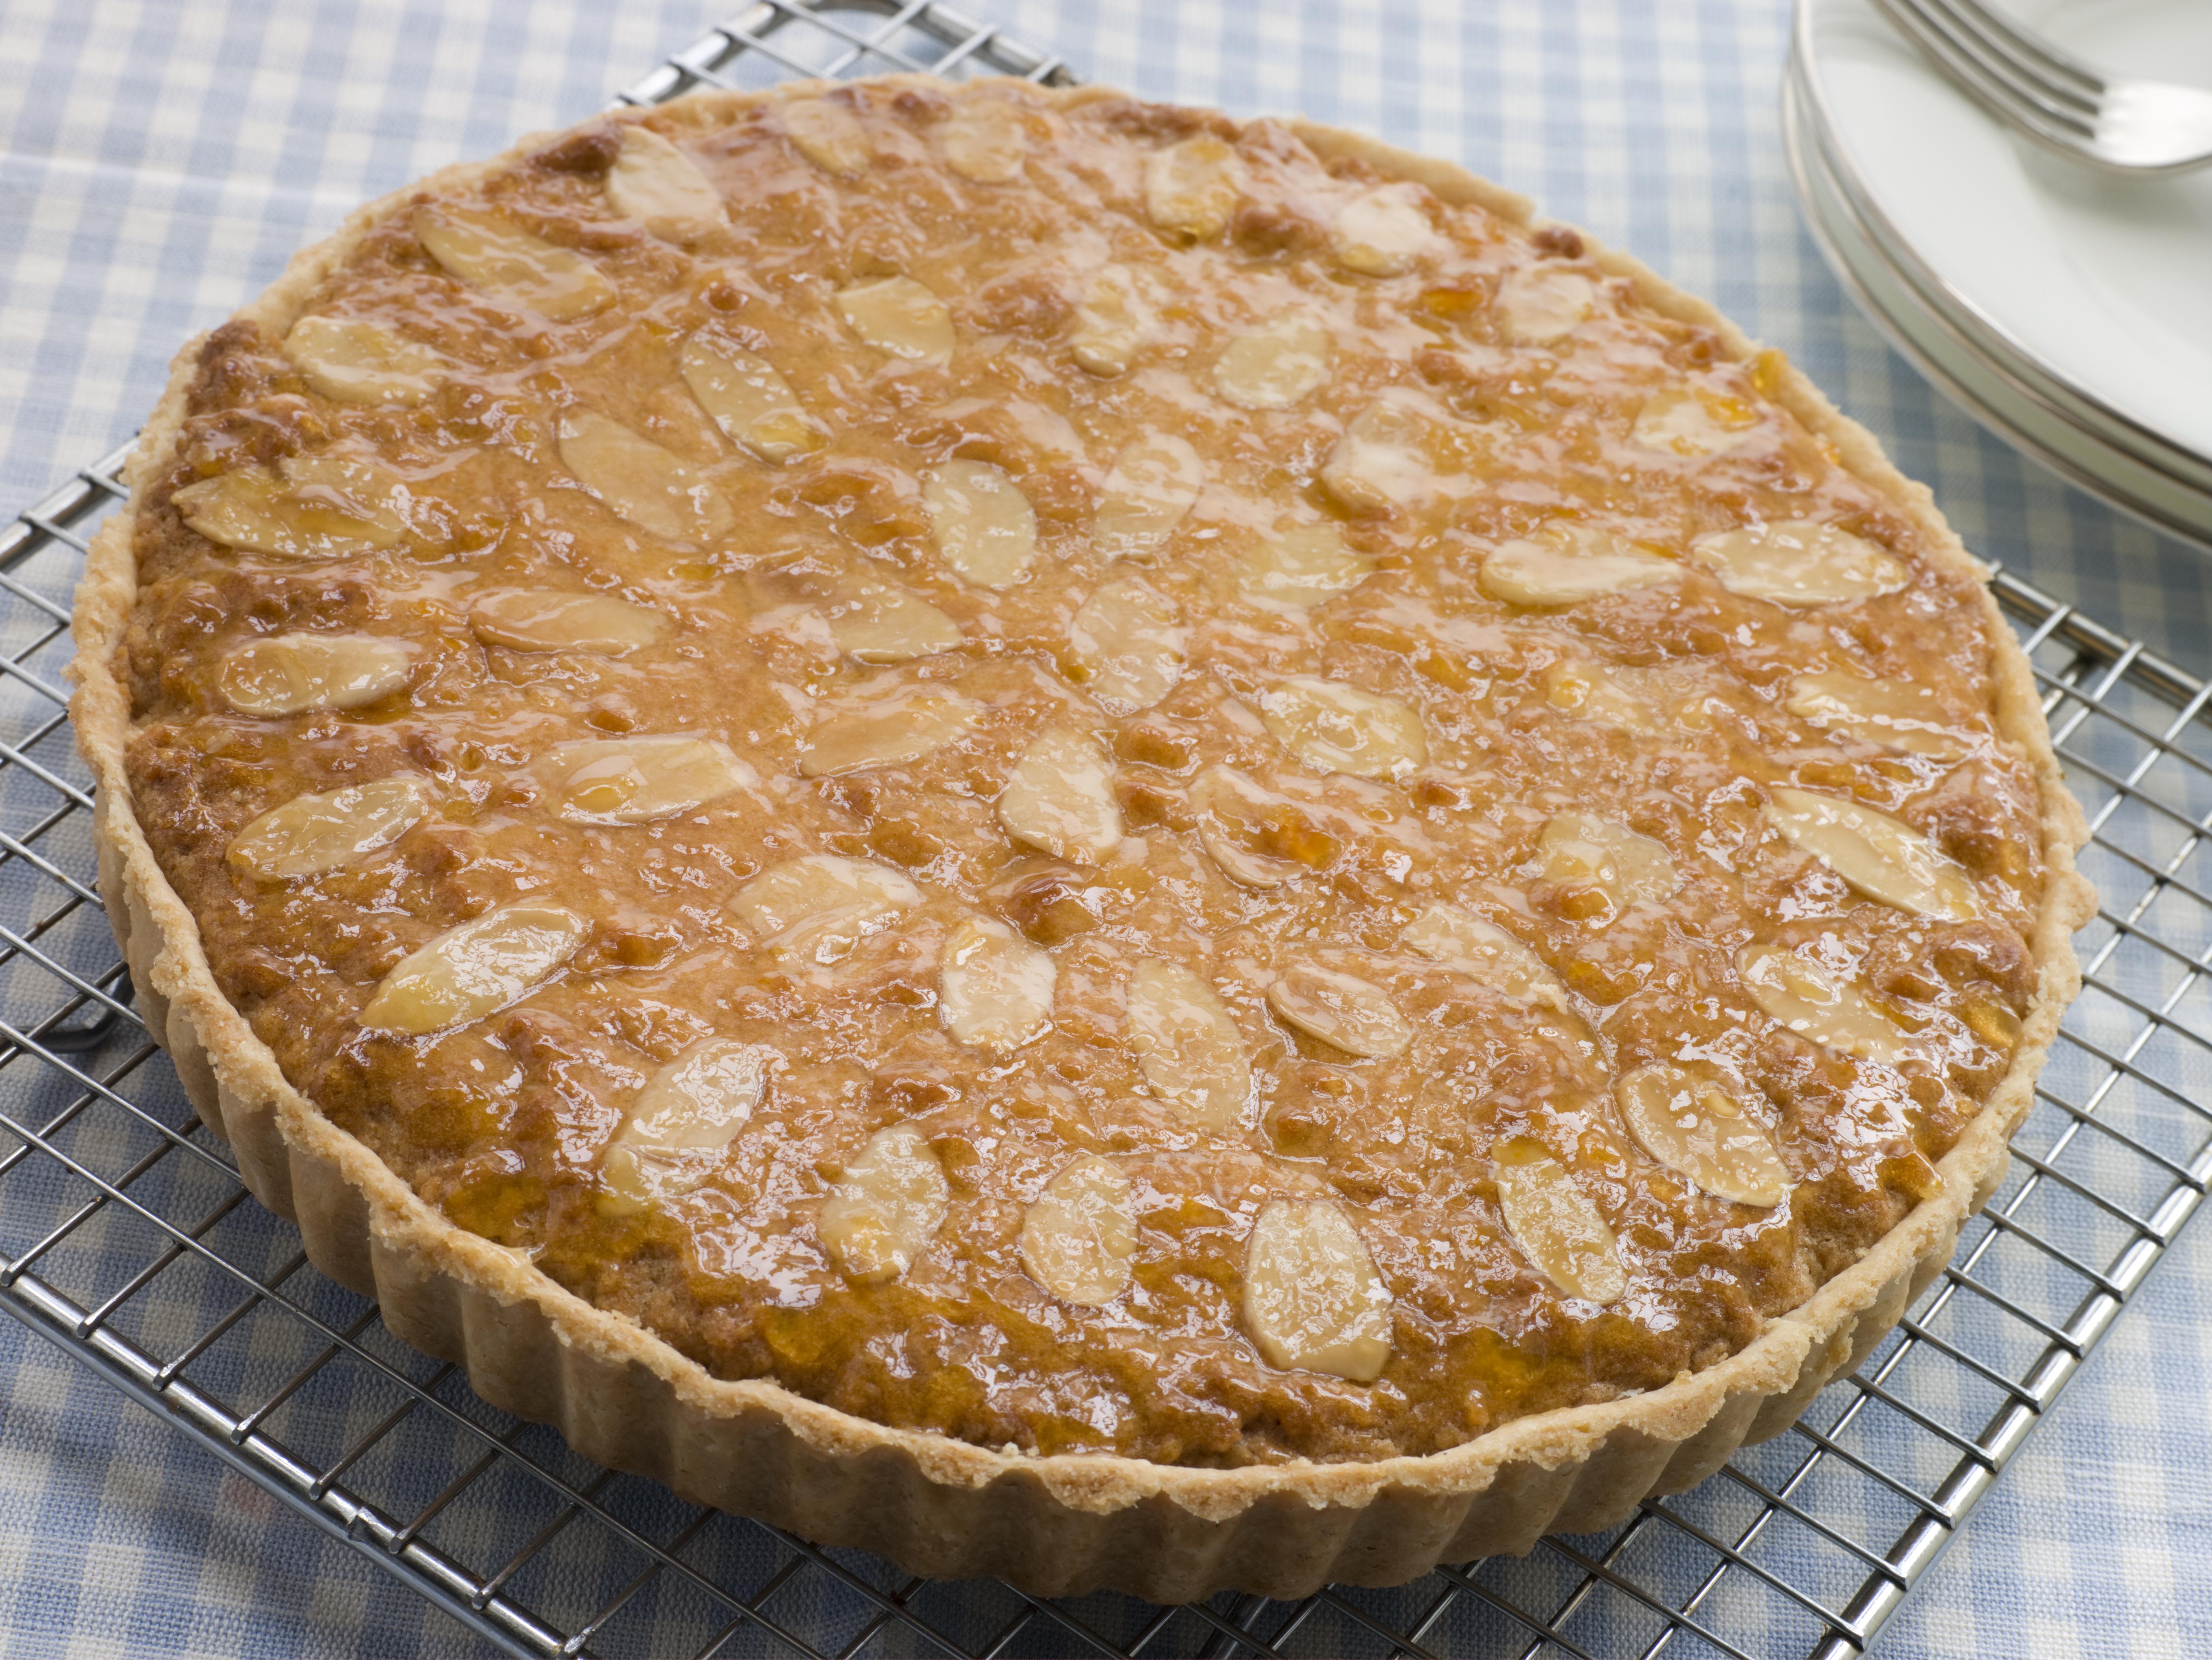 Bakewell Tart: 10 Best Foods Invented in the Peak District